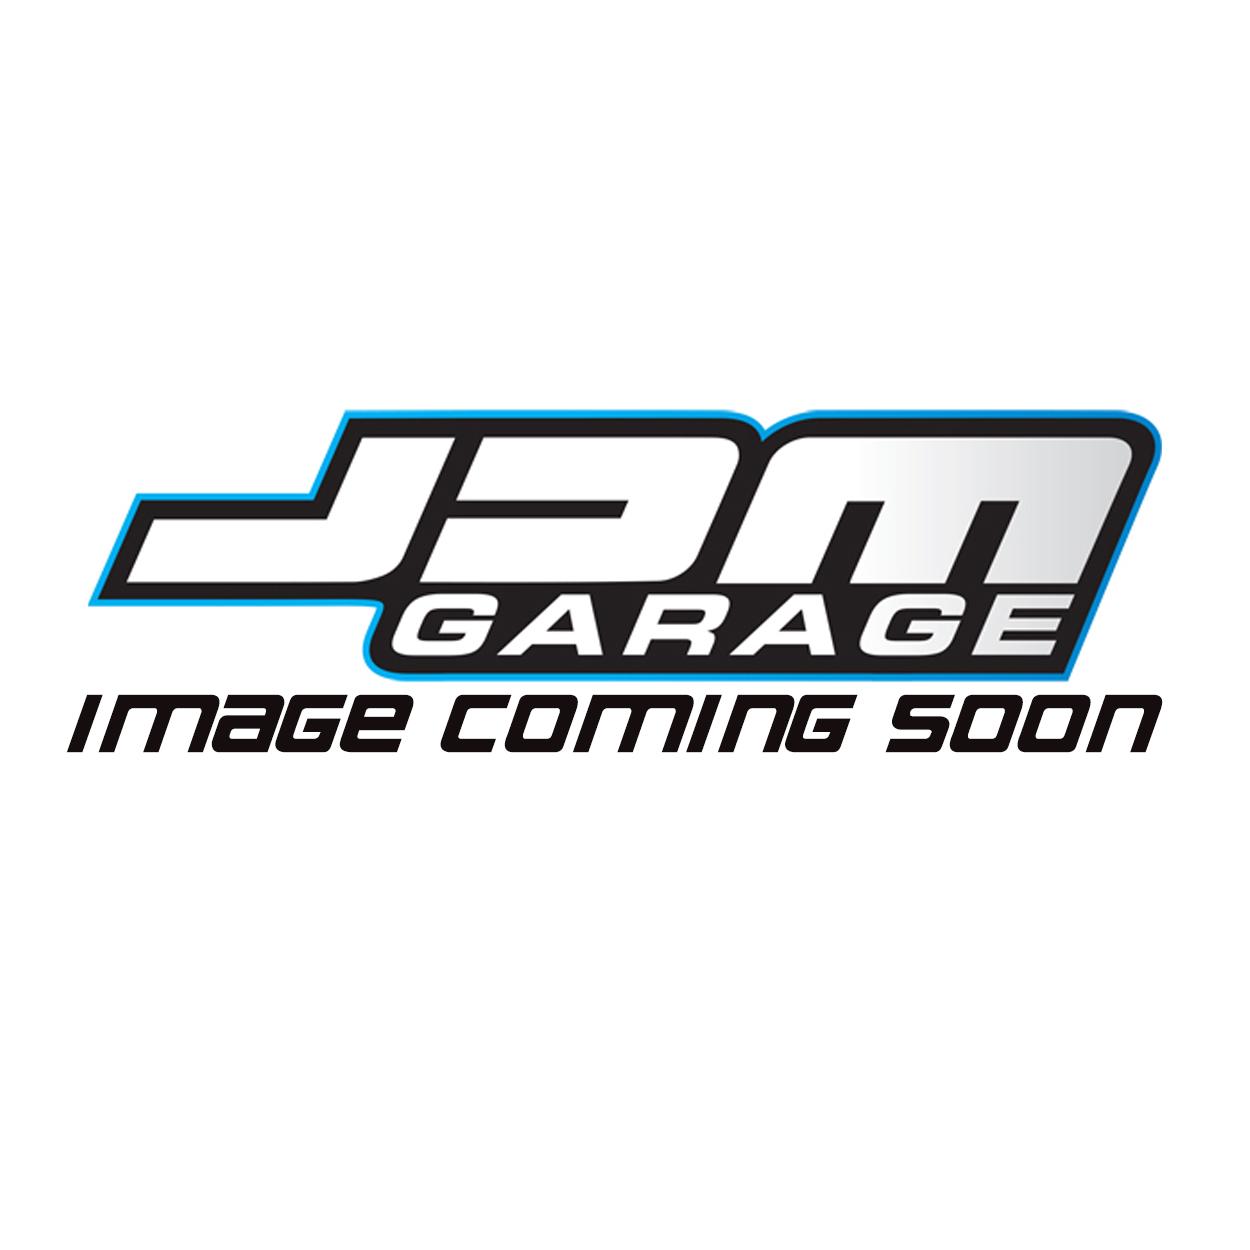 Hawk Front Brake Pads - Subaru Impreza WRX STI 2004 - 2015